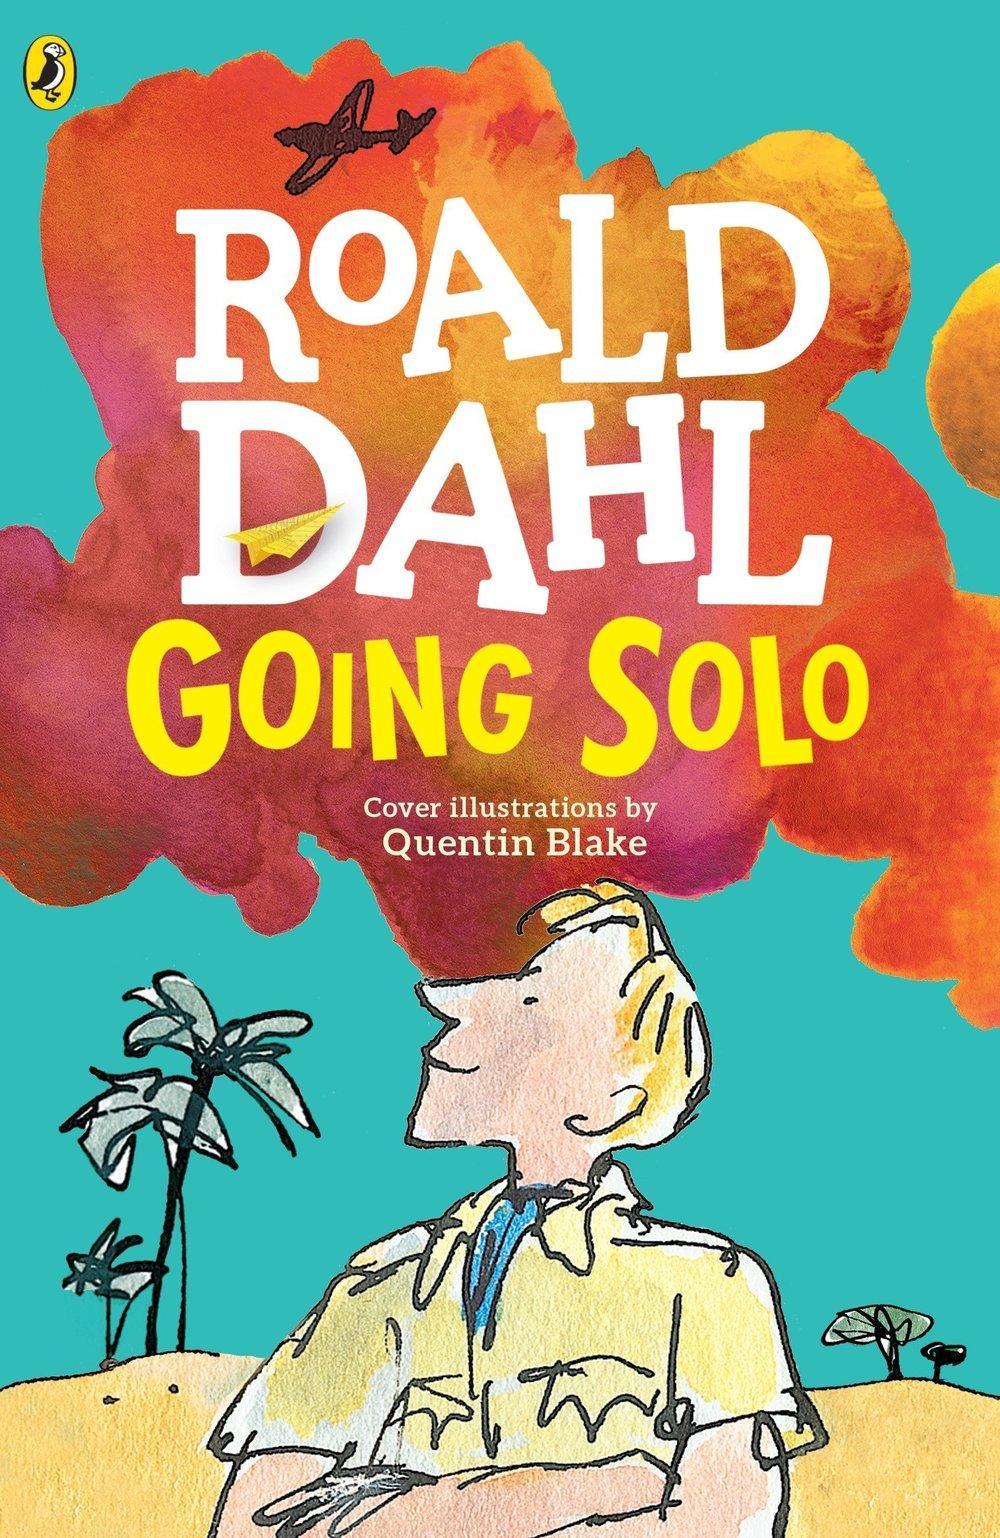 Going Solo Roald Dahl.jpg